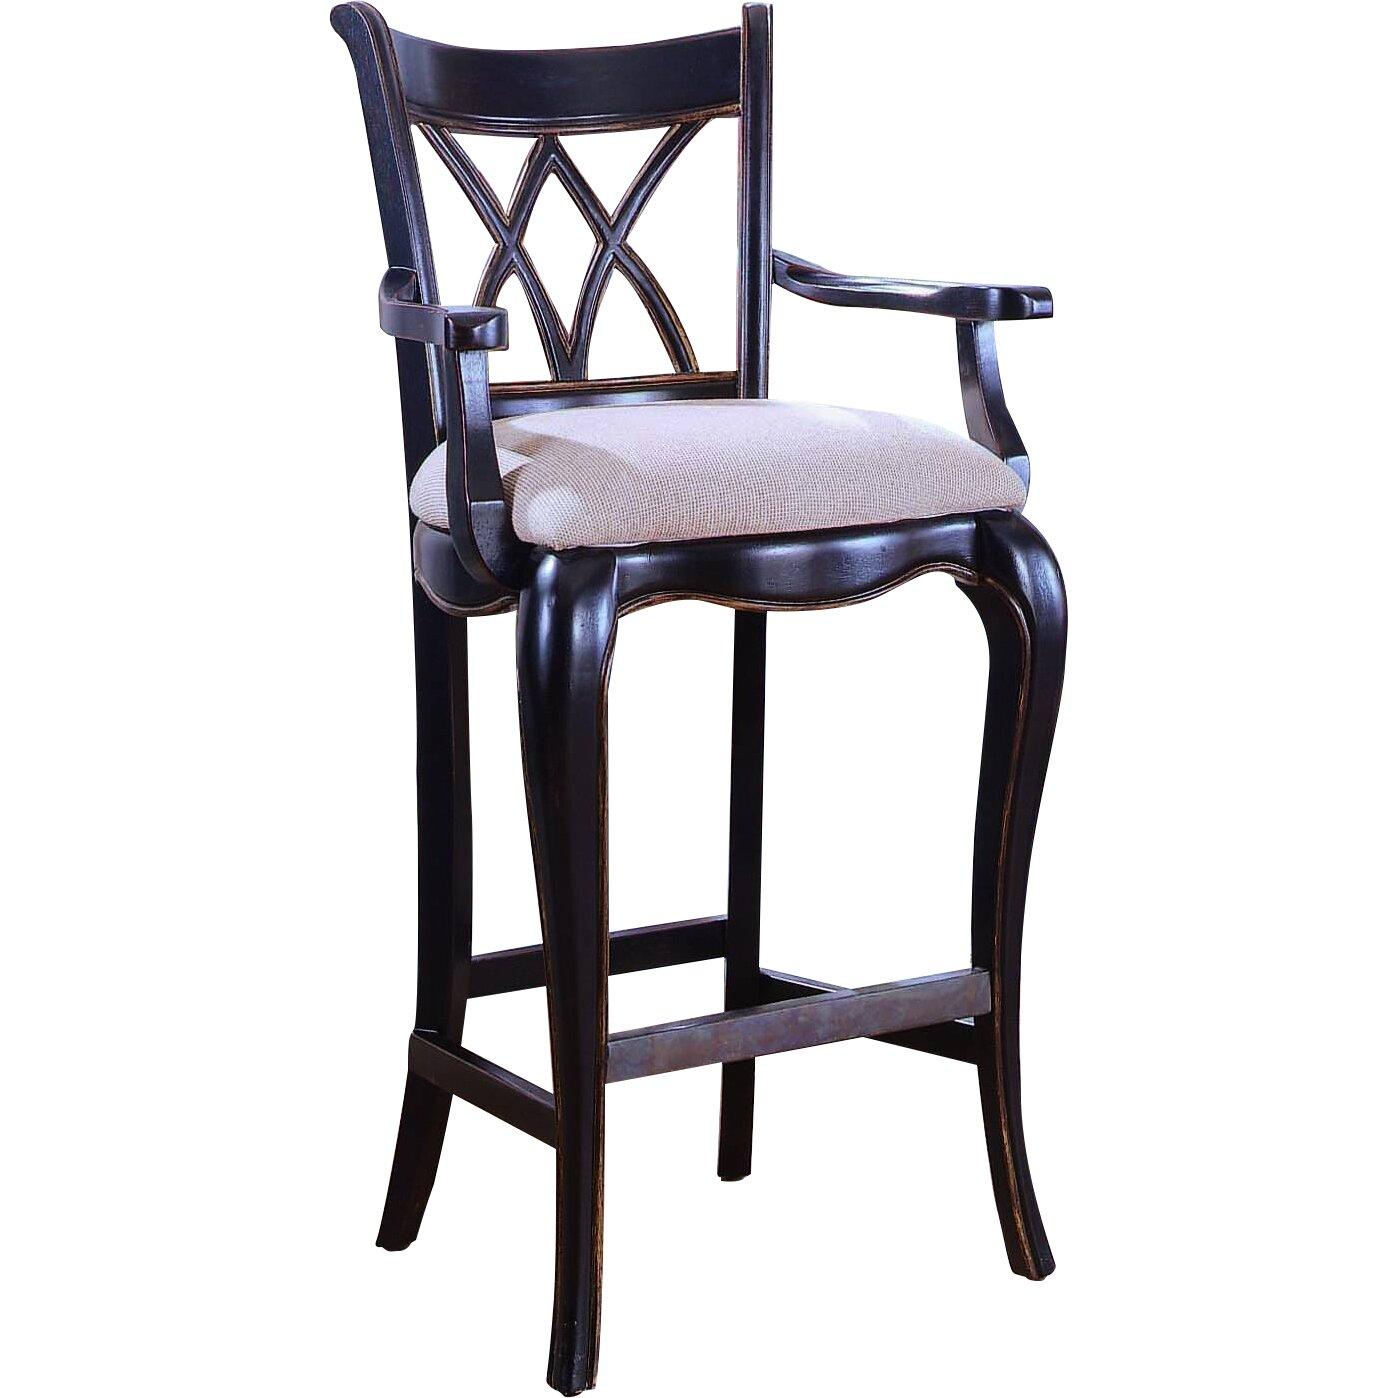 Hooker furniture preston ridge bar stool reviews for Furniture 24